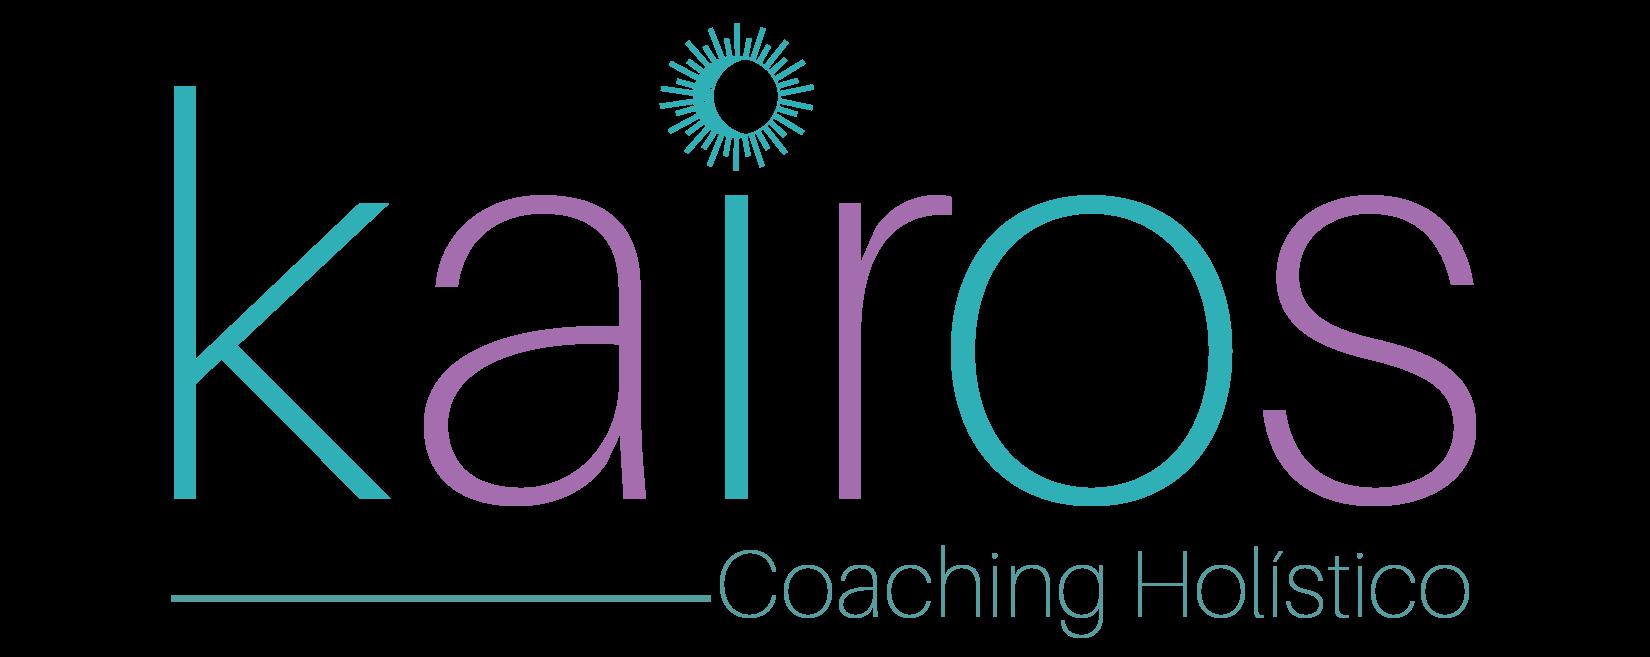 Coaching Holístico Kairos